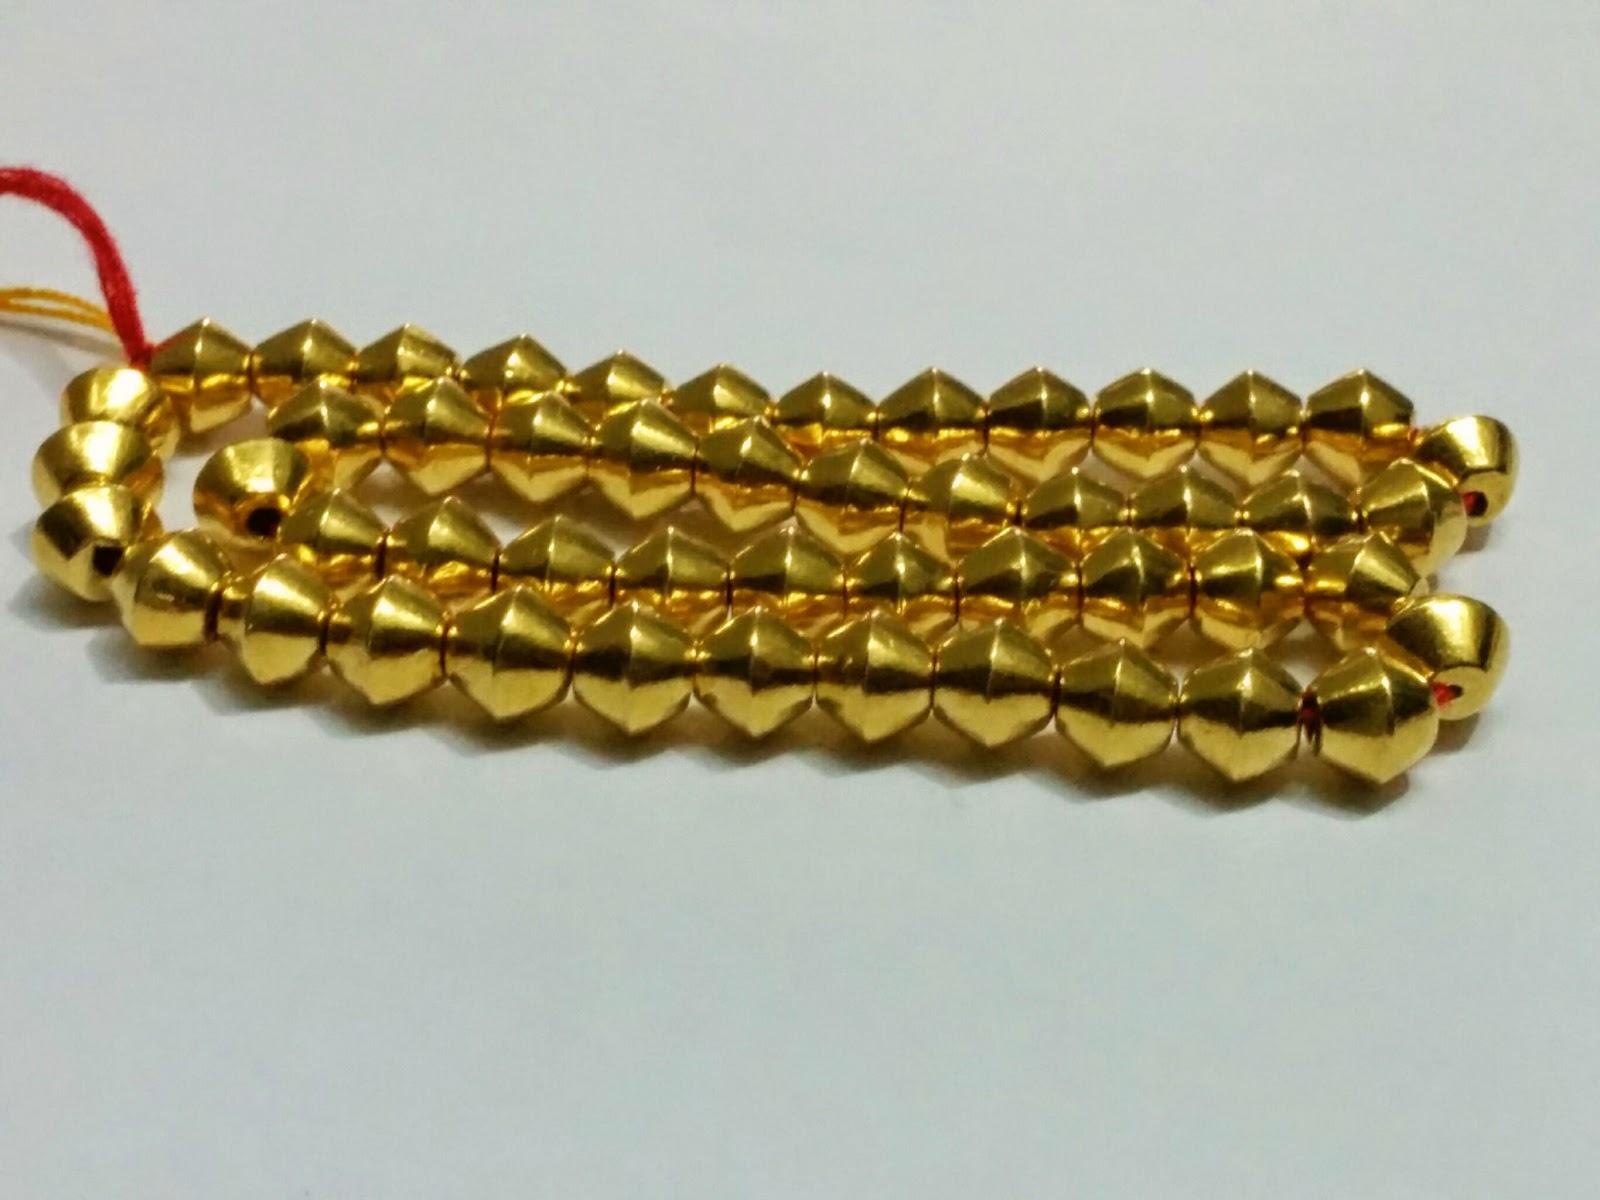 sha himatmal tilokchandji jewellers gold wax bead